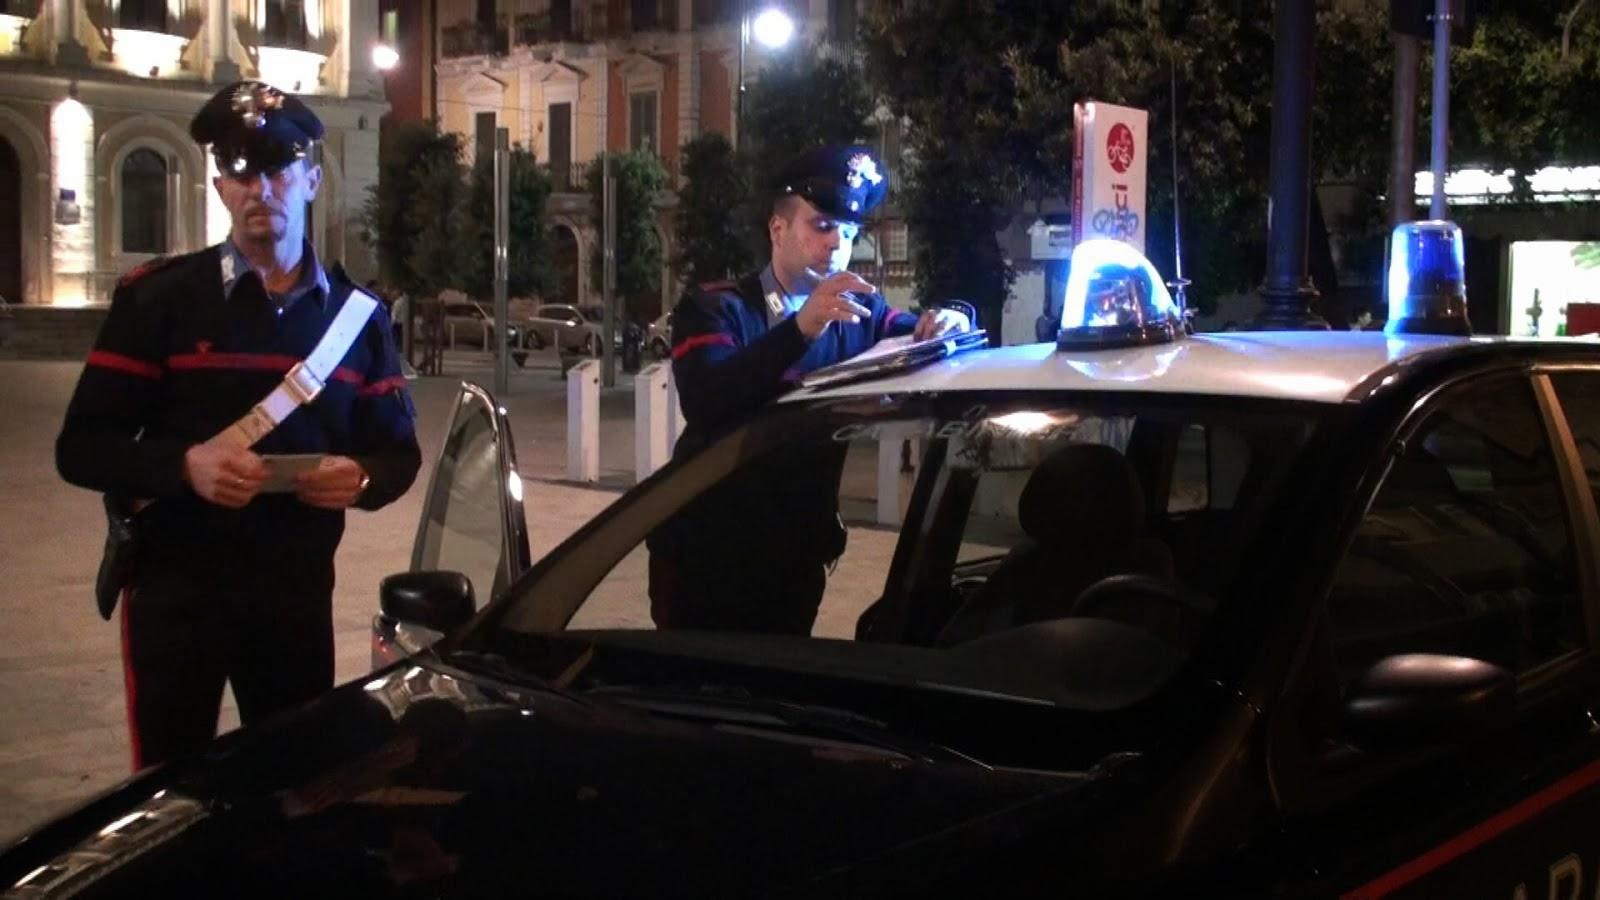 Bari al setaggio dai Carabinieri